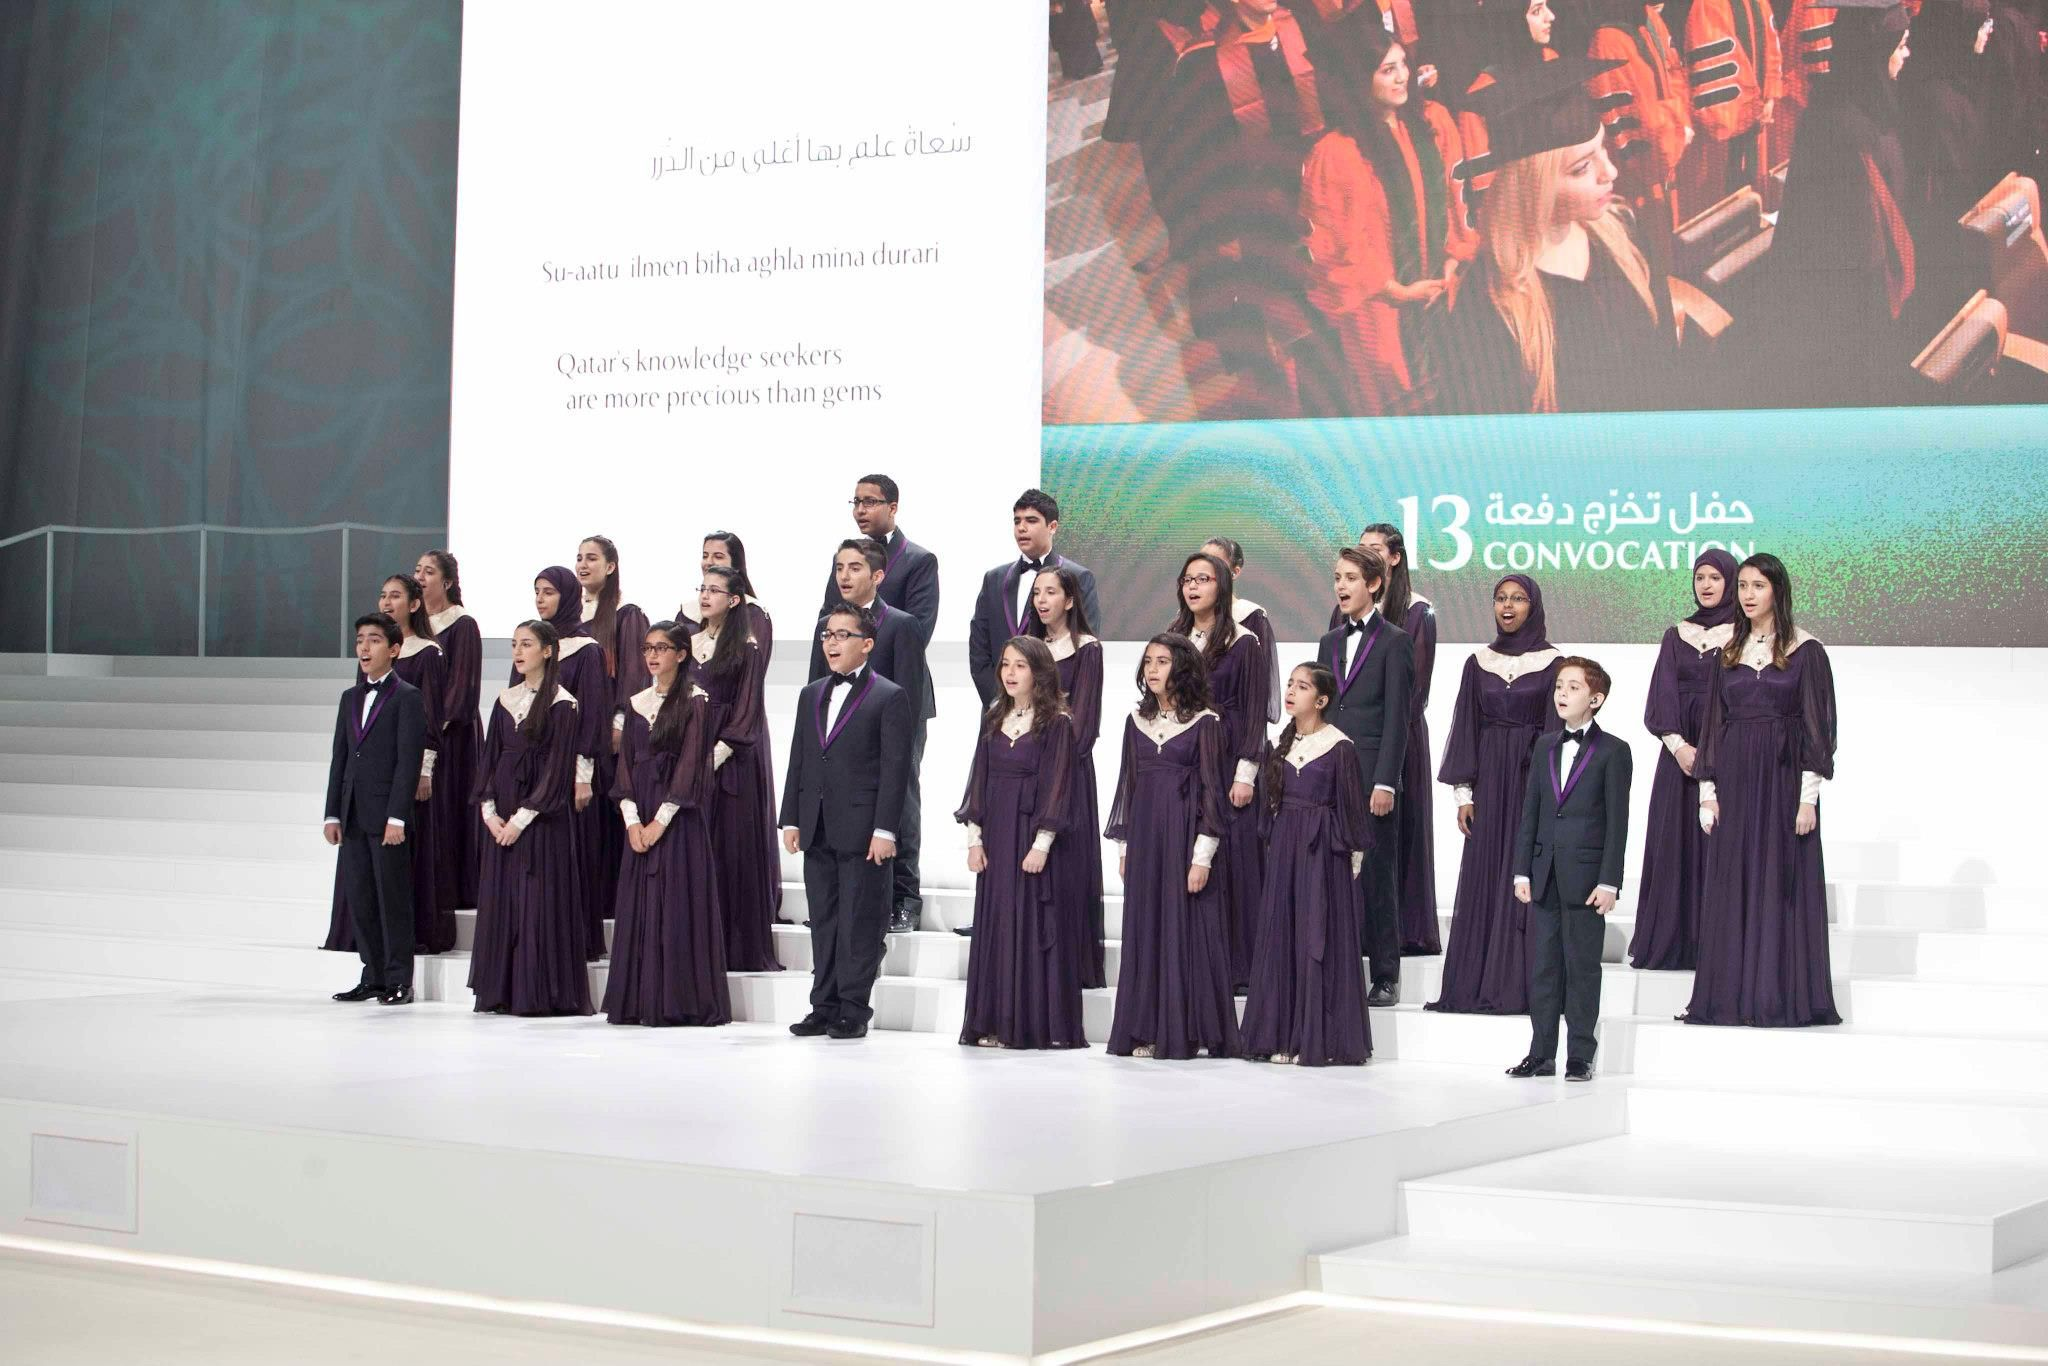 The Siwar Choir Sing The Education City Anthem كورال سوار أثناء إنشادهم النشيد الرسمي للمدينة التعليمية